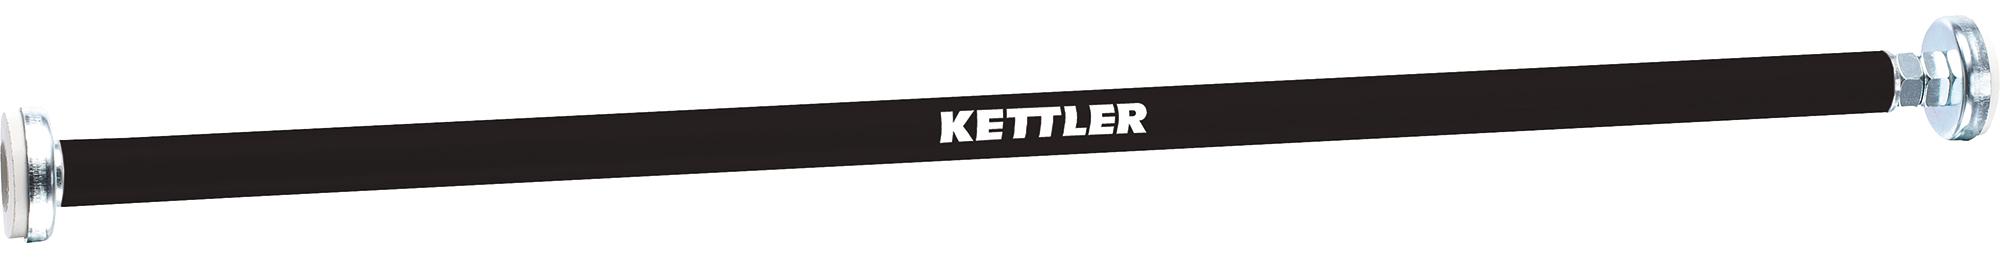 Kettler Турник в дверной проем Kettler цена